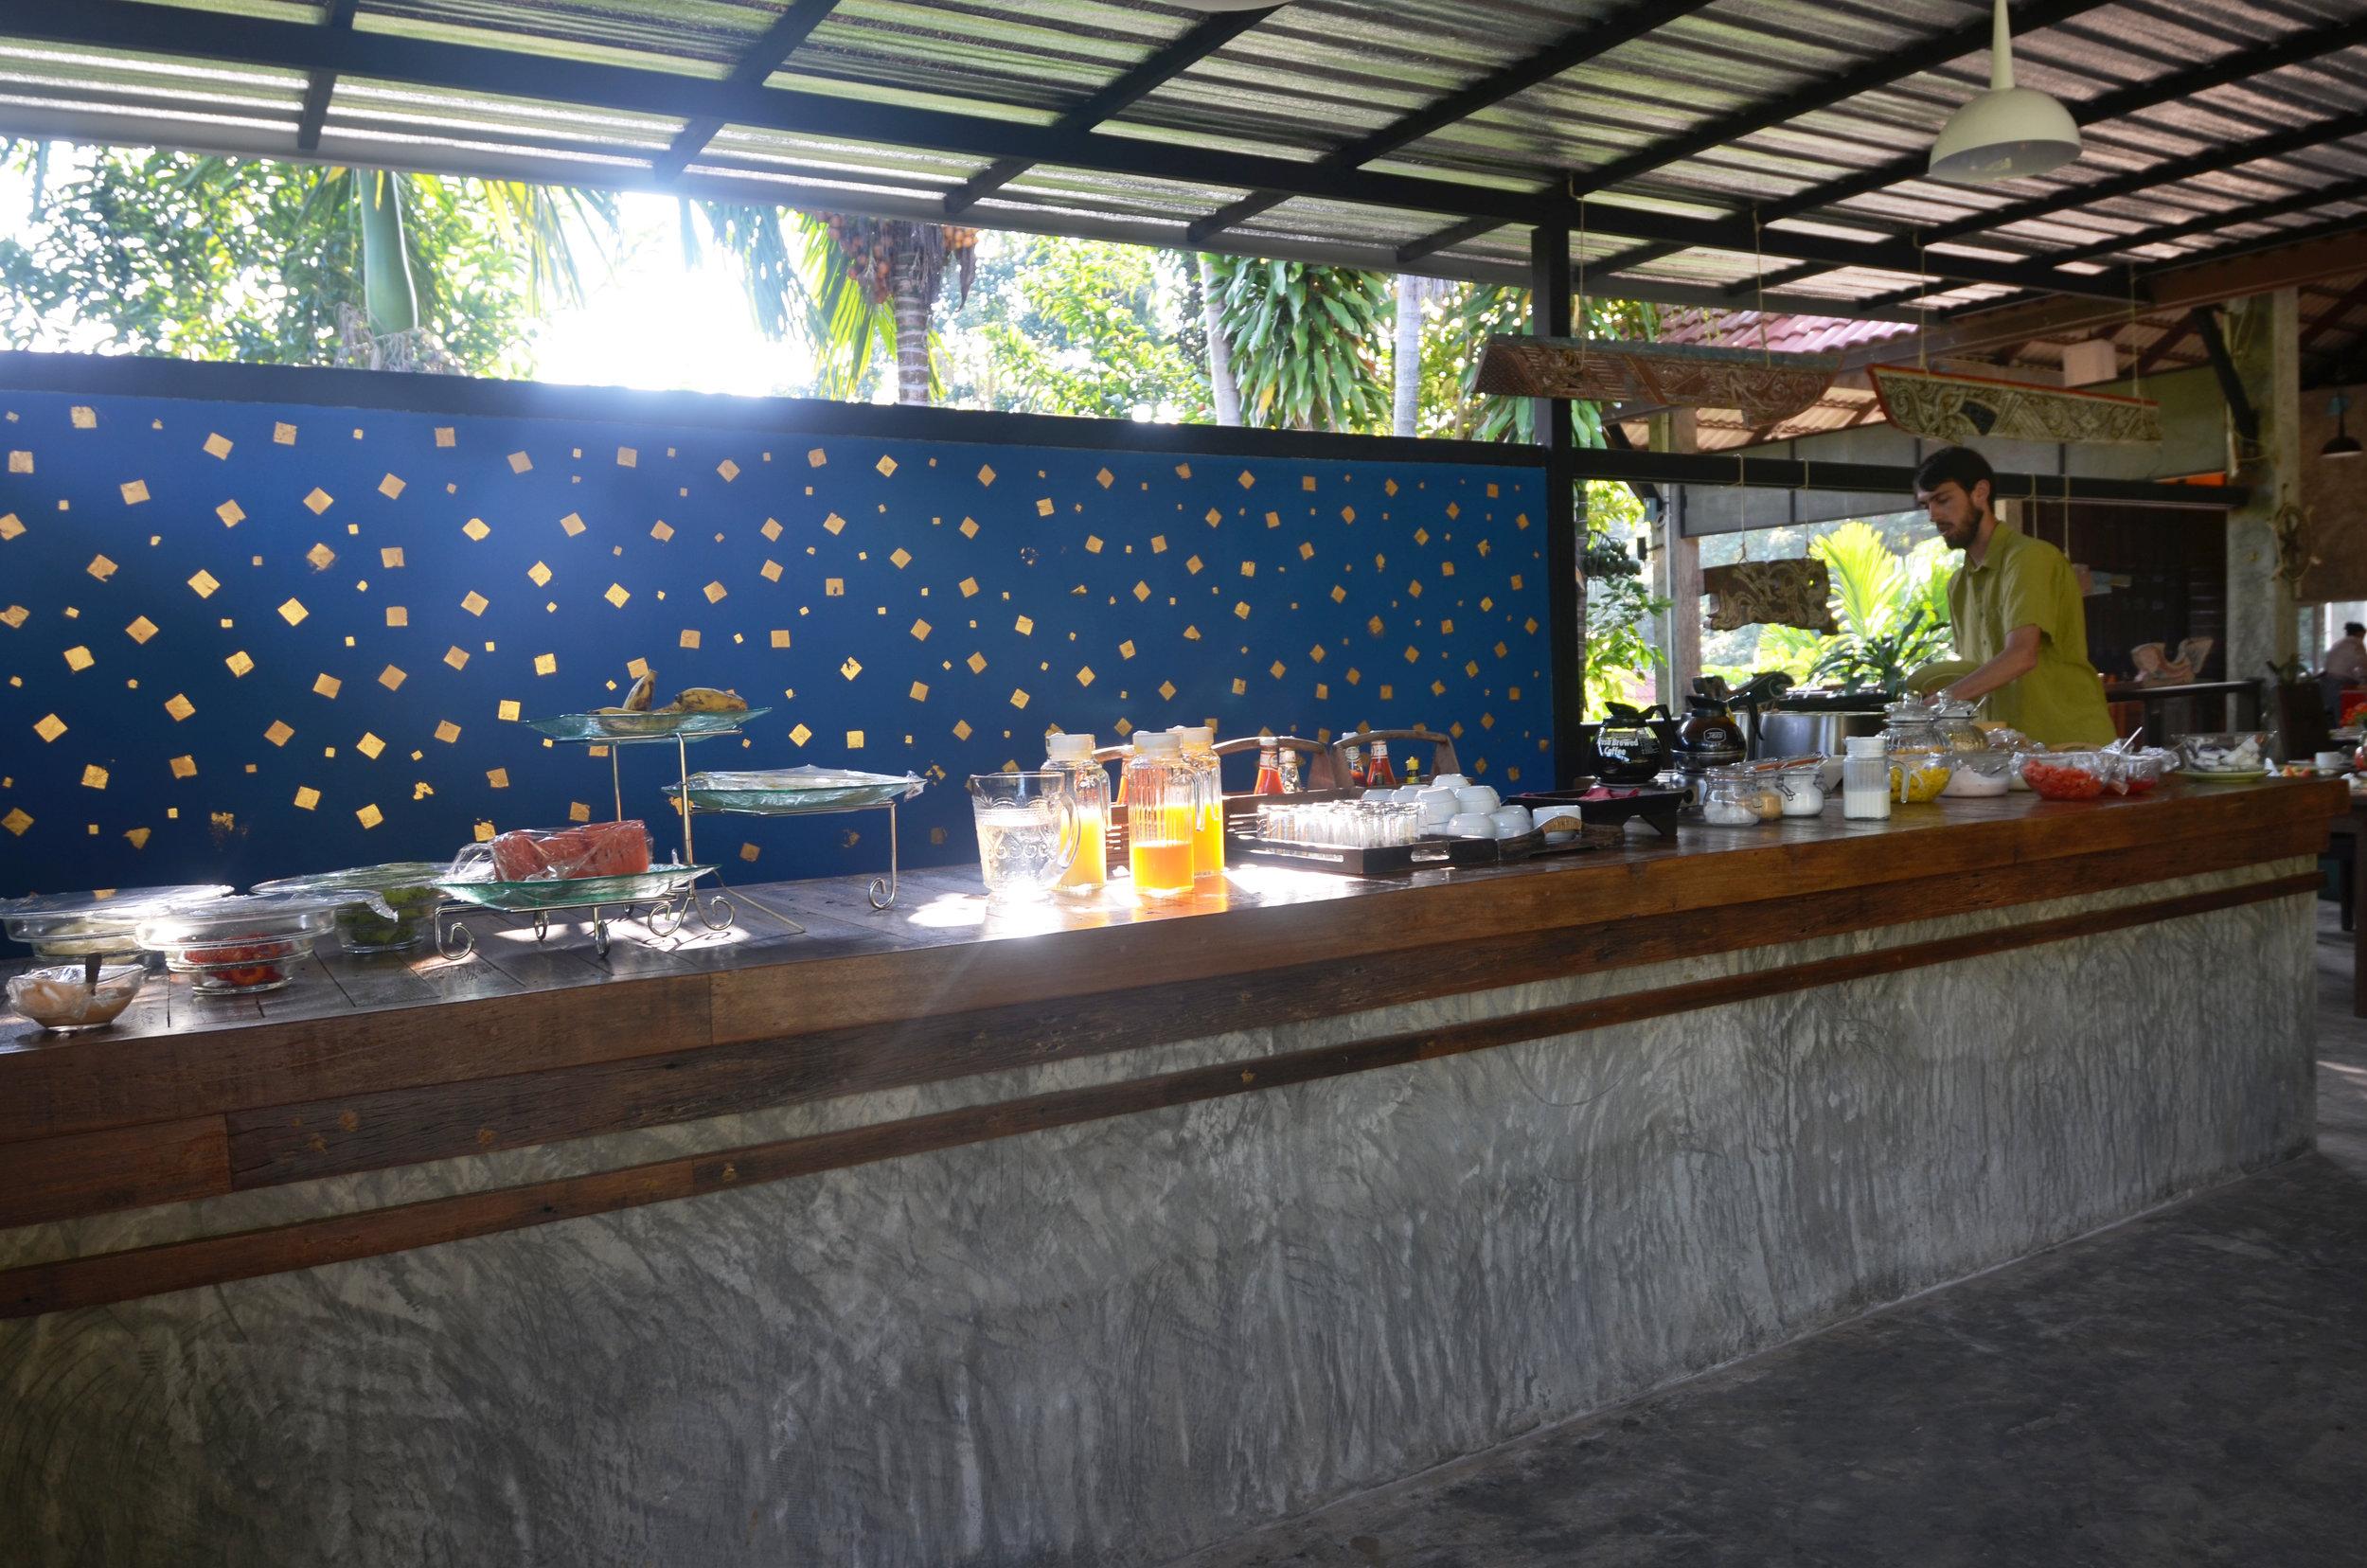 Chaw Kaw Cher's breakfast buffet